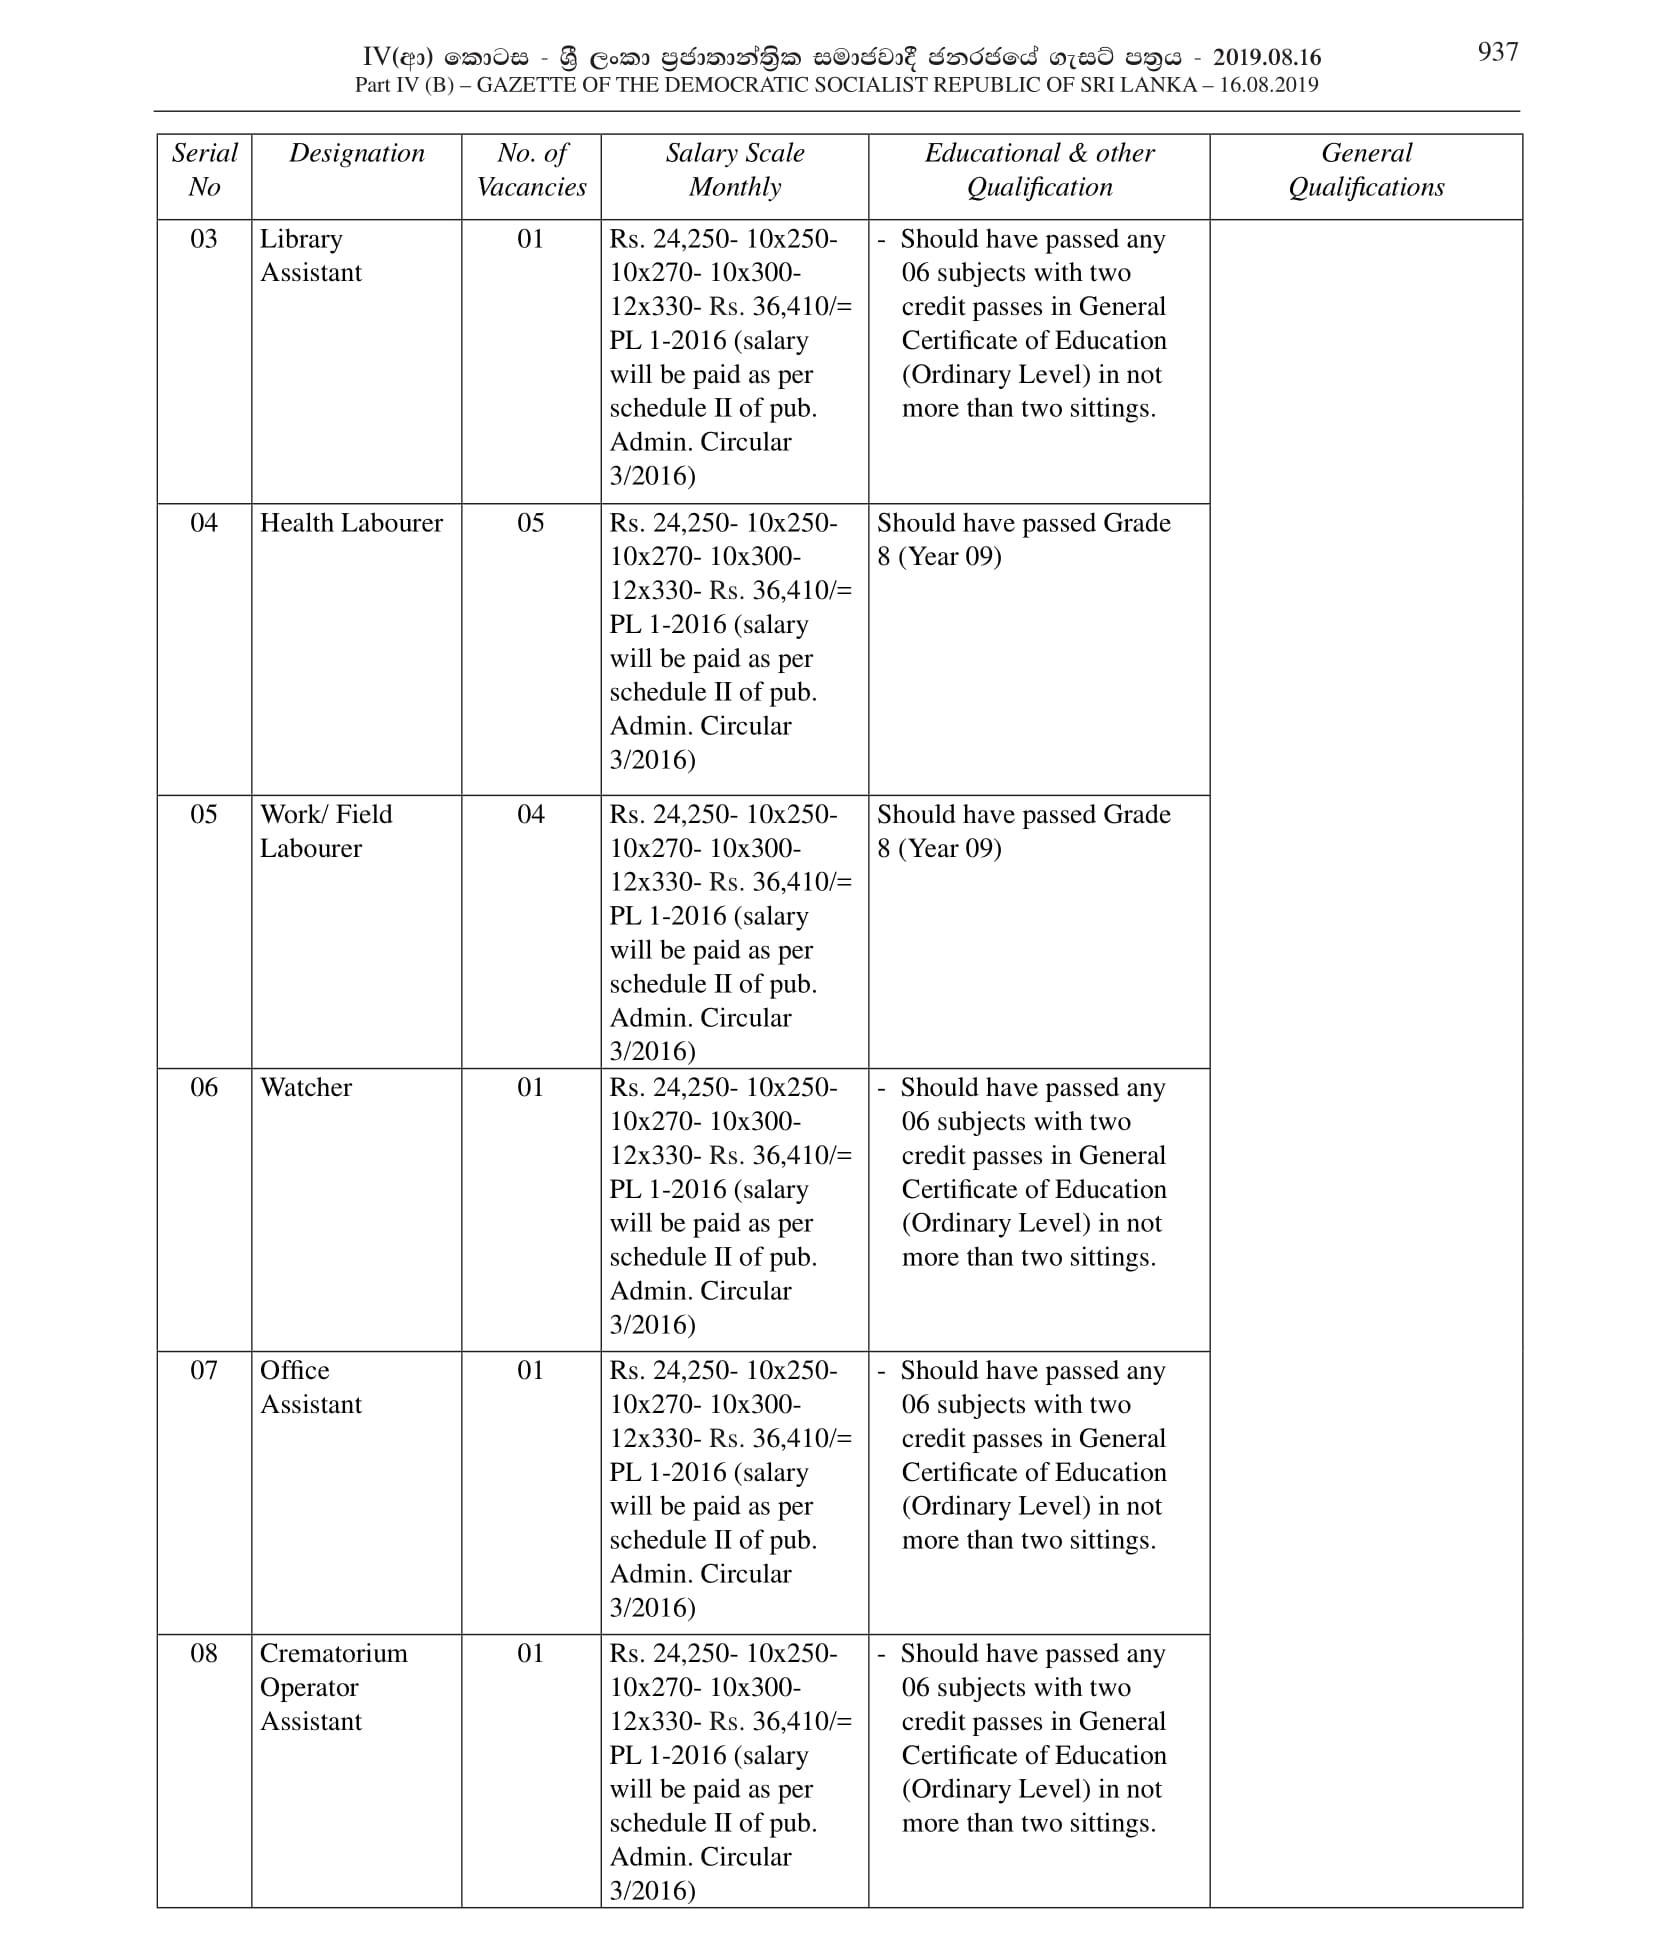 Office Assistant, Library Assistant, Crematorium Operator, Driver, Health Labourer, Work/ Field Labourer, Watcher, Crematorium Operator Assistant - Akuressa Pradeshiya Sabha